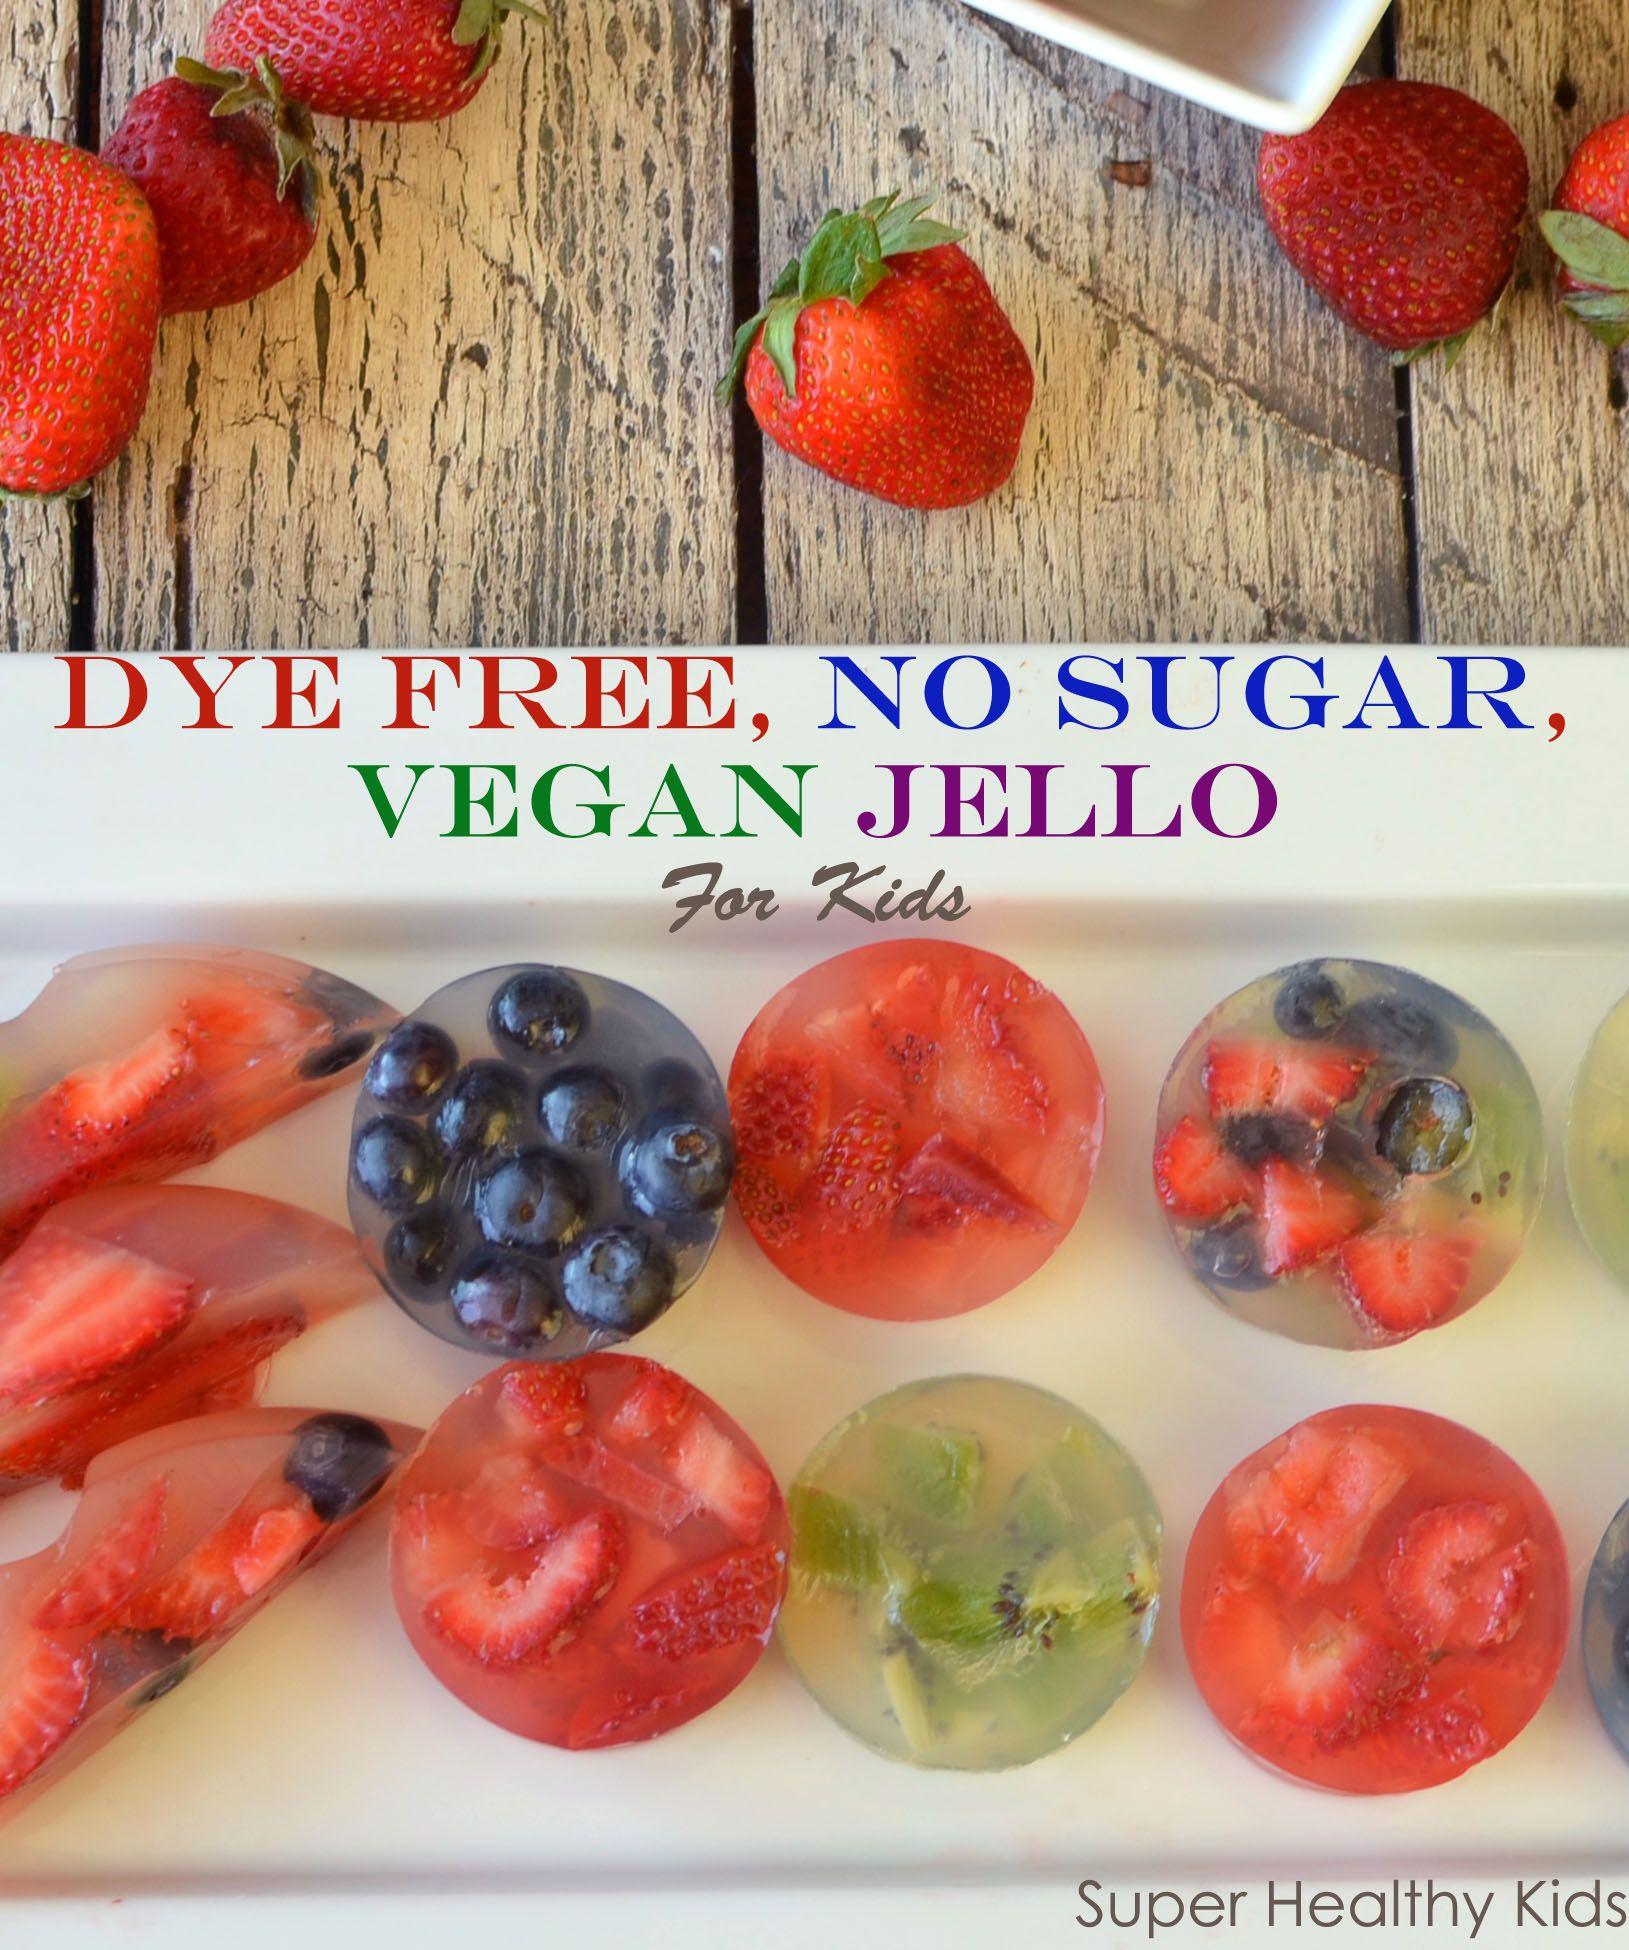 Check out Dye Free No Sugar Jello for Kids. It's so easy ...